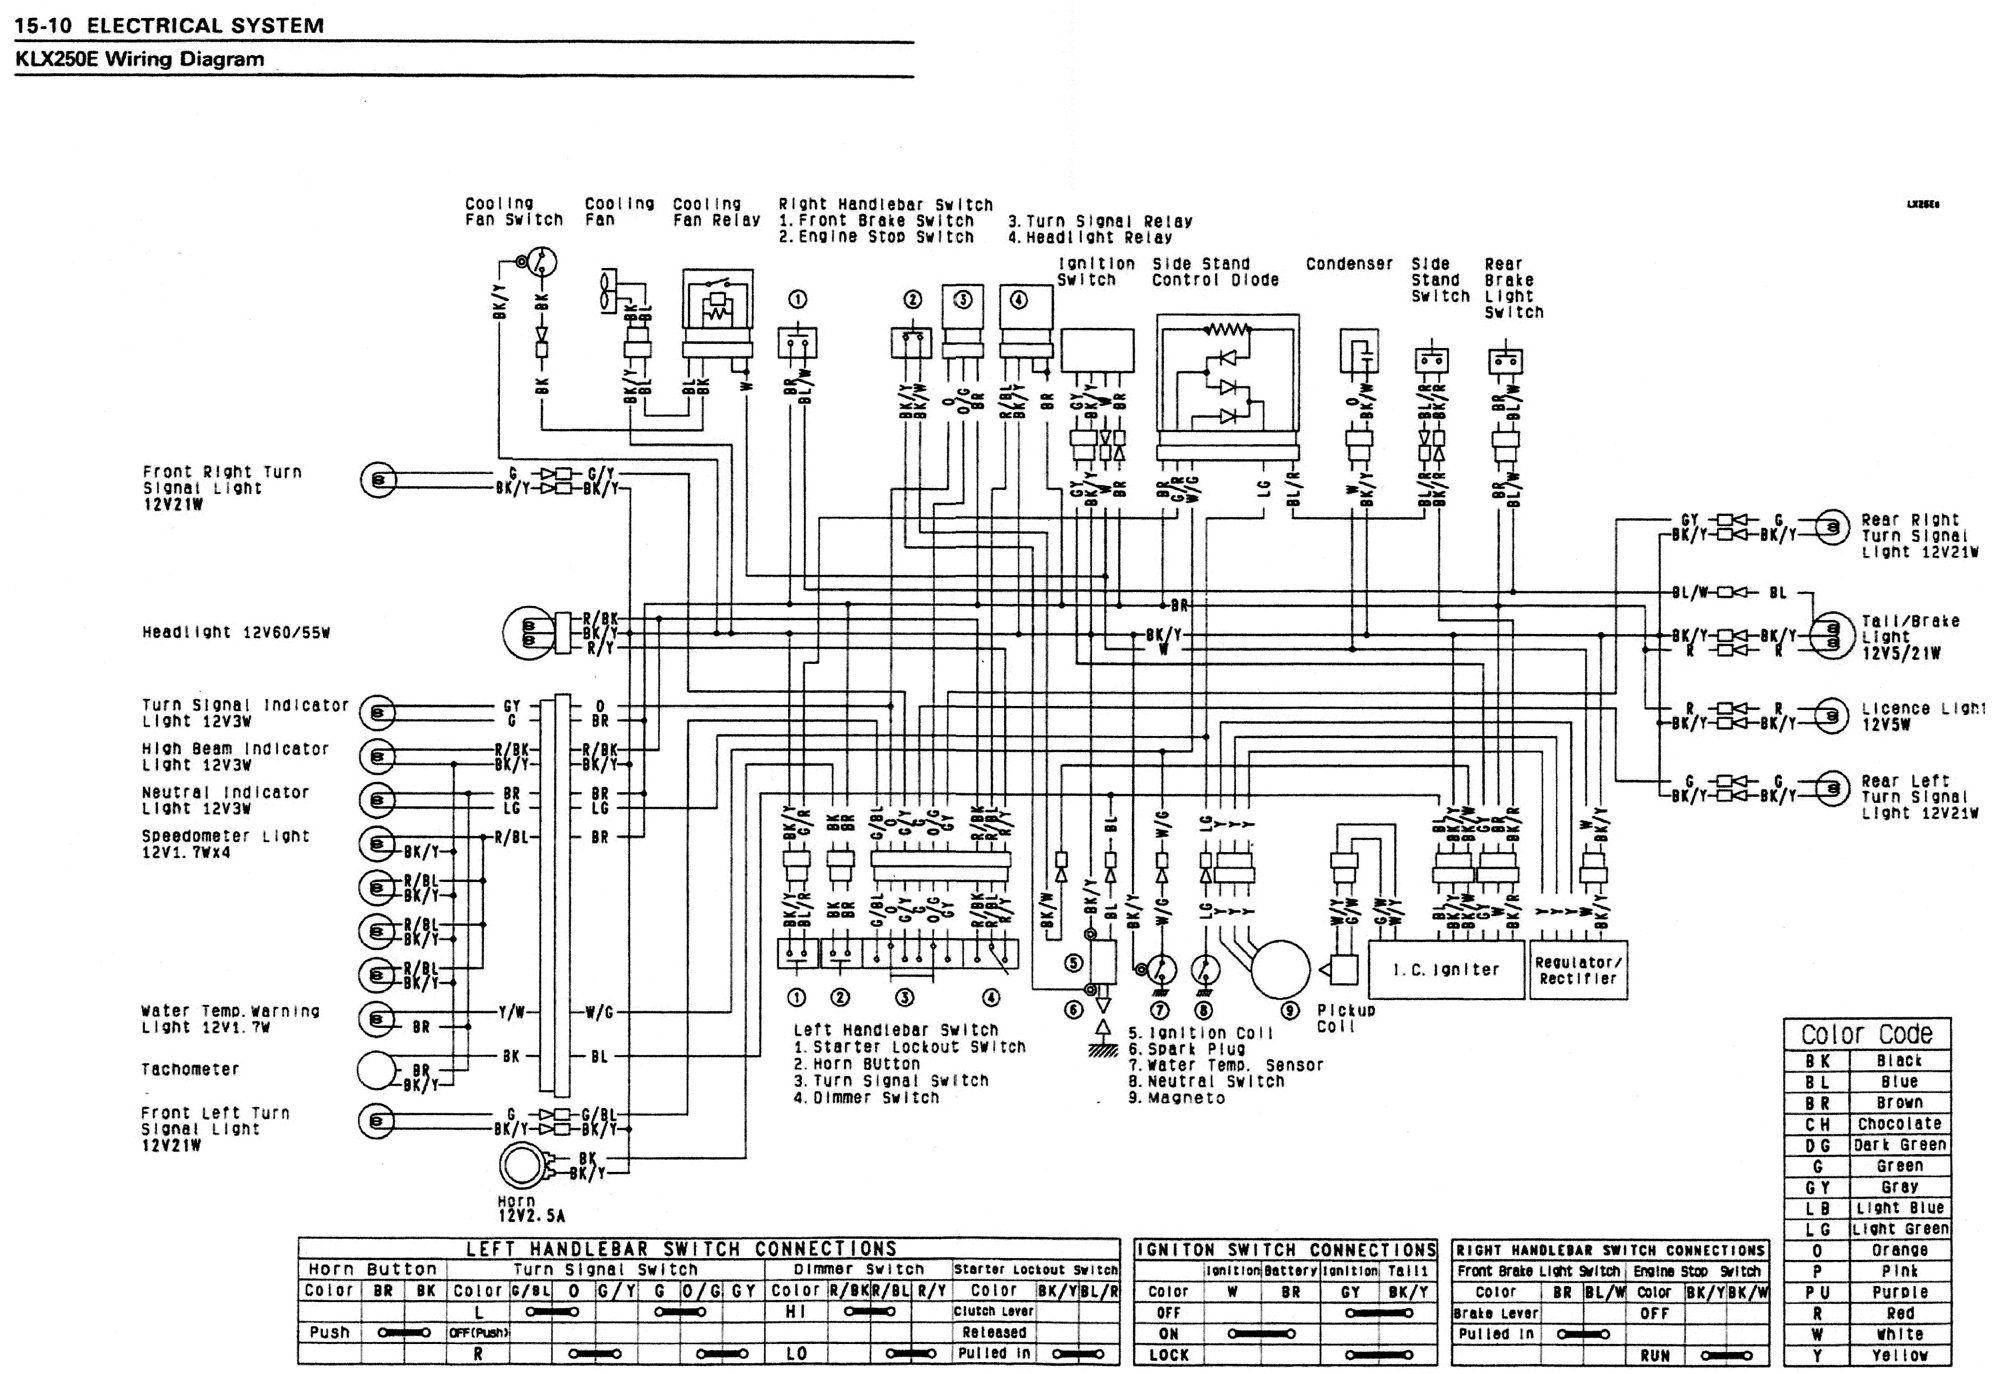 [DIAGRAM_38IU]  Klf 300 Wiring Diagram. kawasaki klf 300 wiring diagram diagram cafe racer.  87 klf 300 wiring diagrams machine repair manual. i have a 1987 kawasaki  bayou 300cc 2 wheel drive i was. | 1990 Kawasaki Bayou Wiring Diagram |  | 2002-acura-tl-radio.info